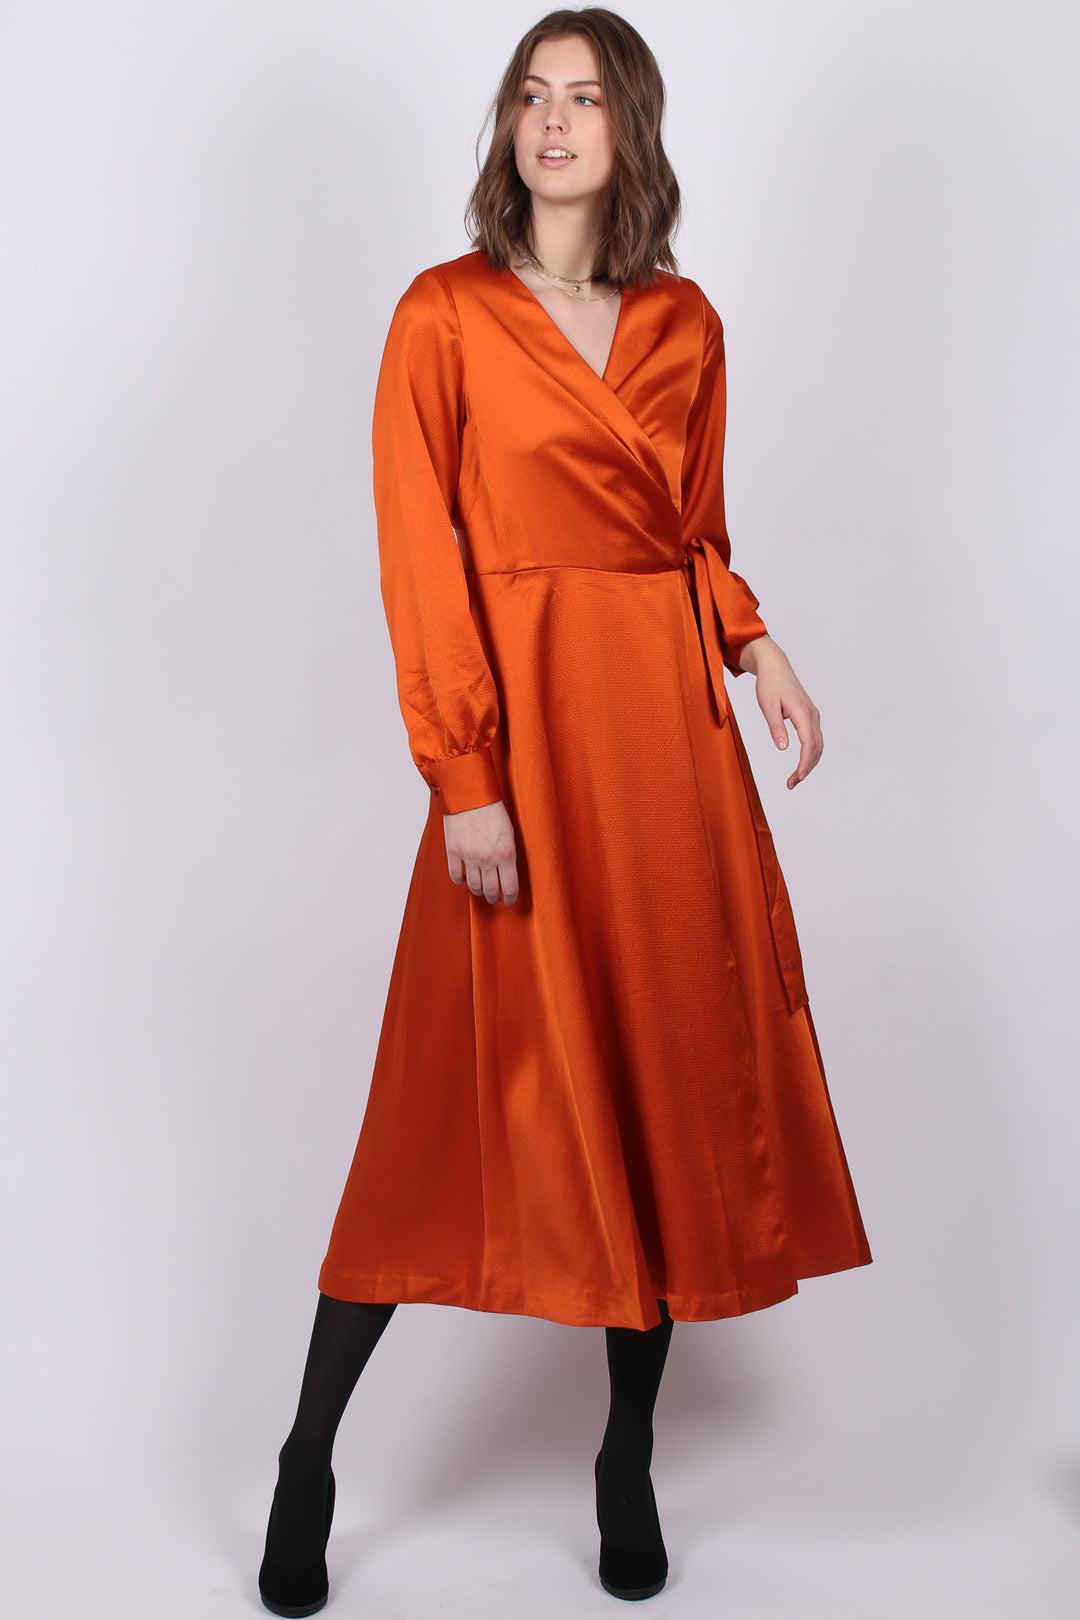 MAUD Wrap Dress oransje kjole